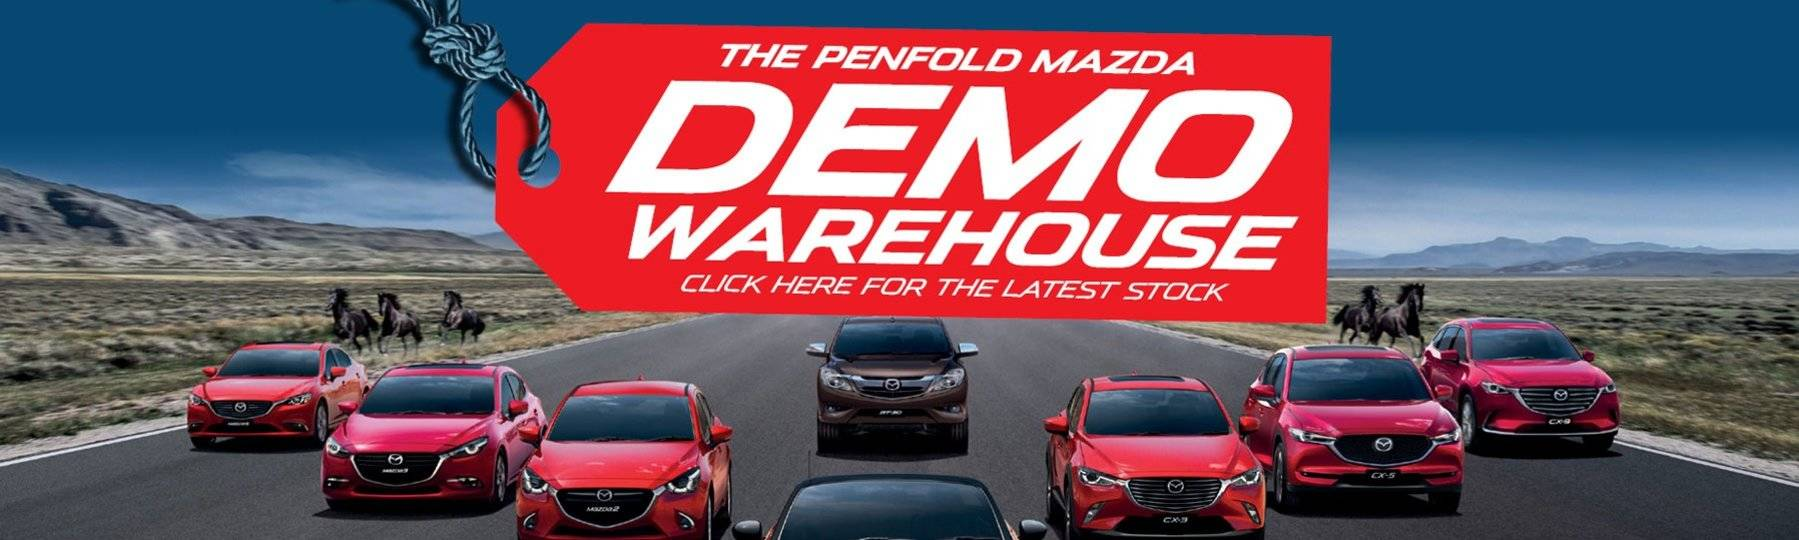 Penfold Mazda Demo Warehouse